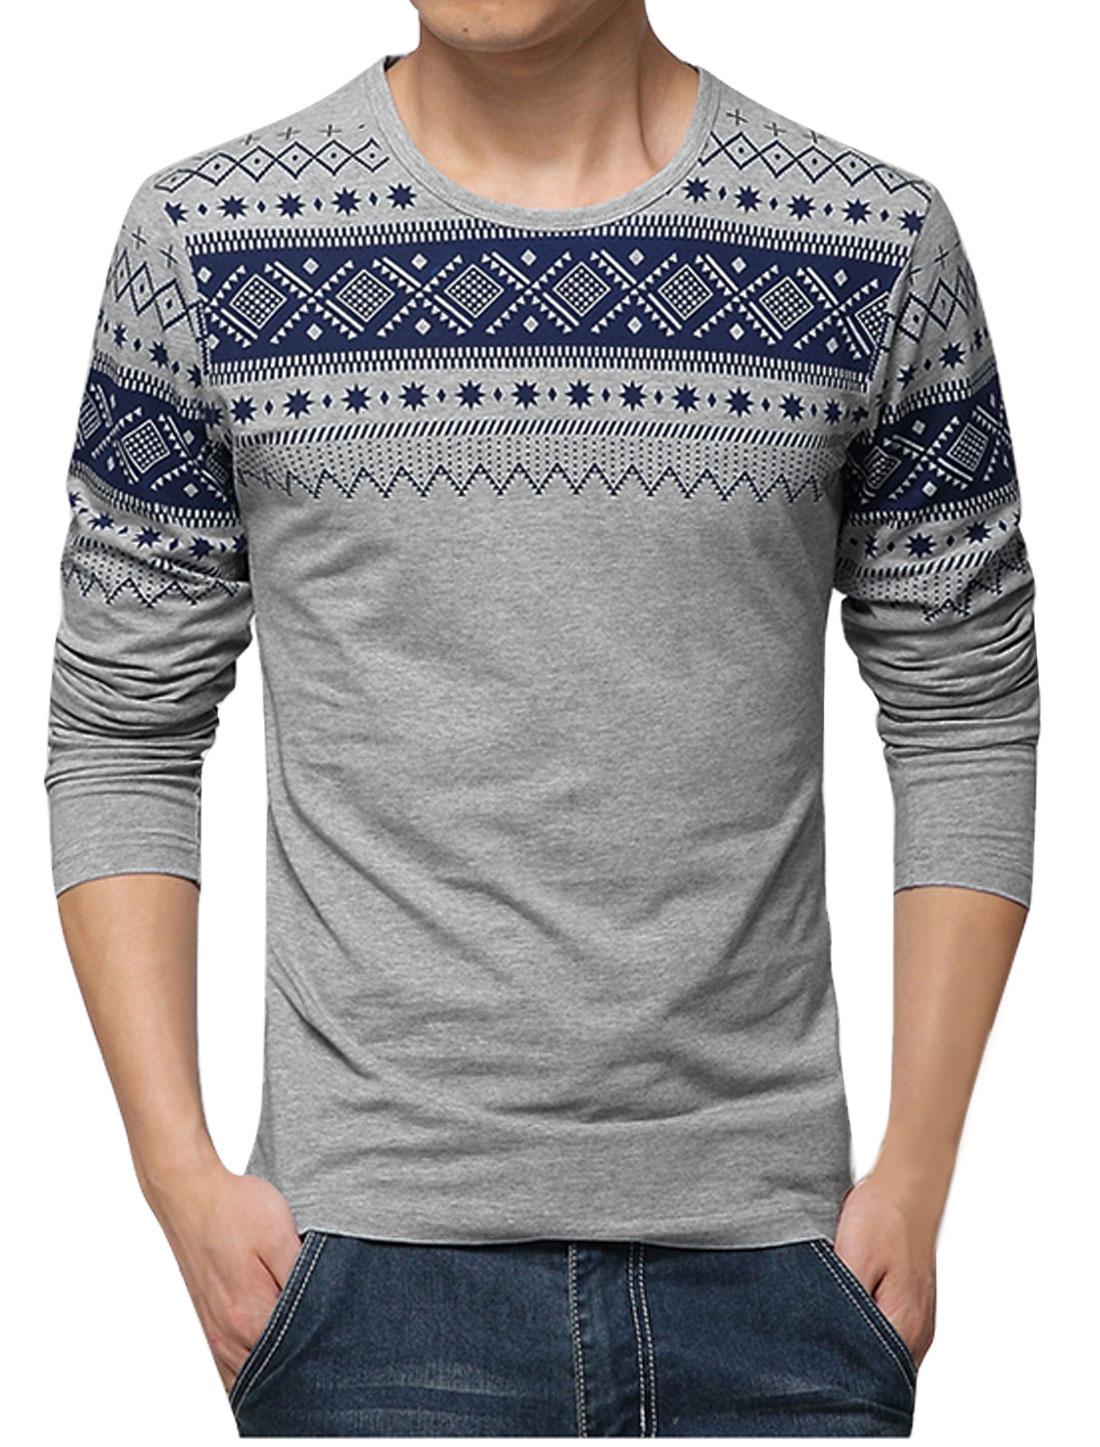 Man Round Neck Long Sleeves Geometric Prints Slipover T-Shirts Gray M